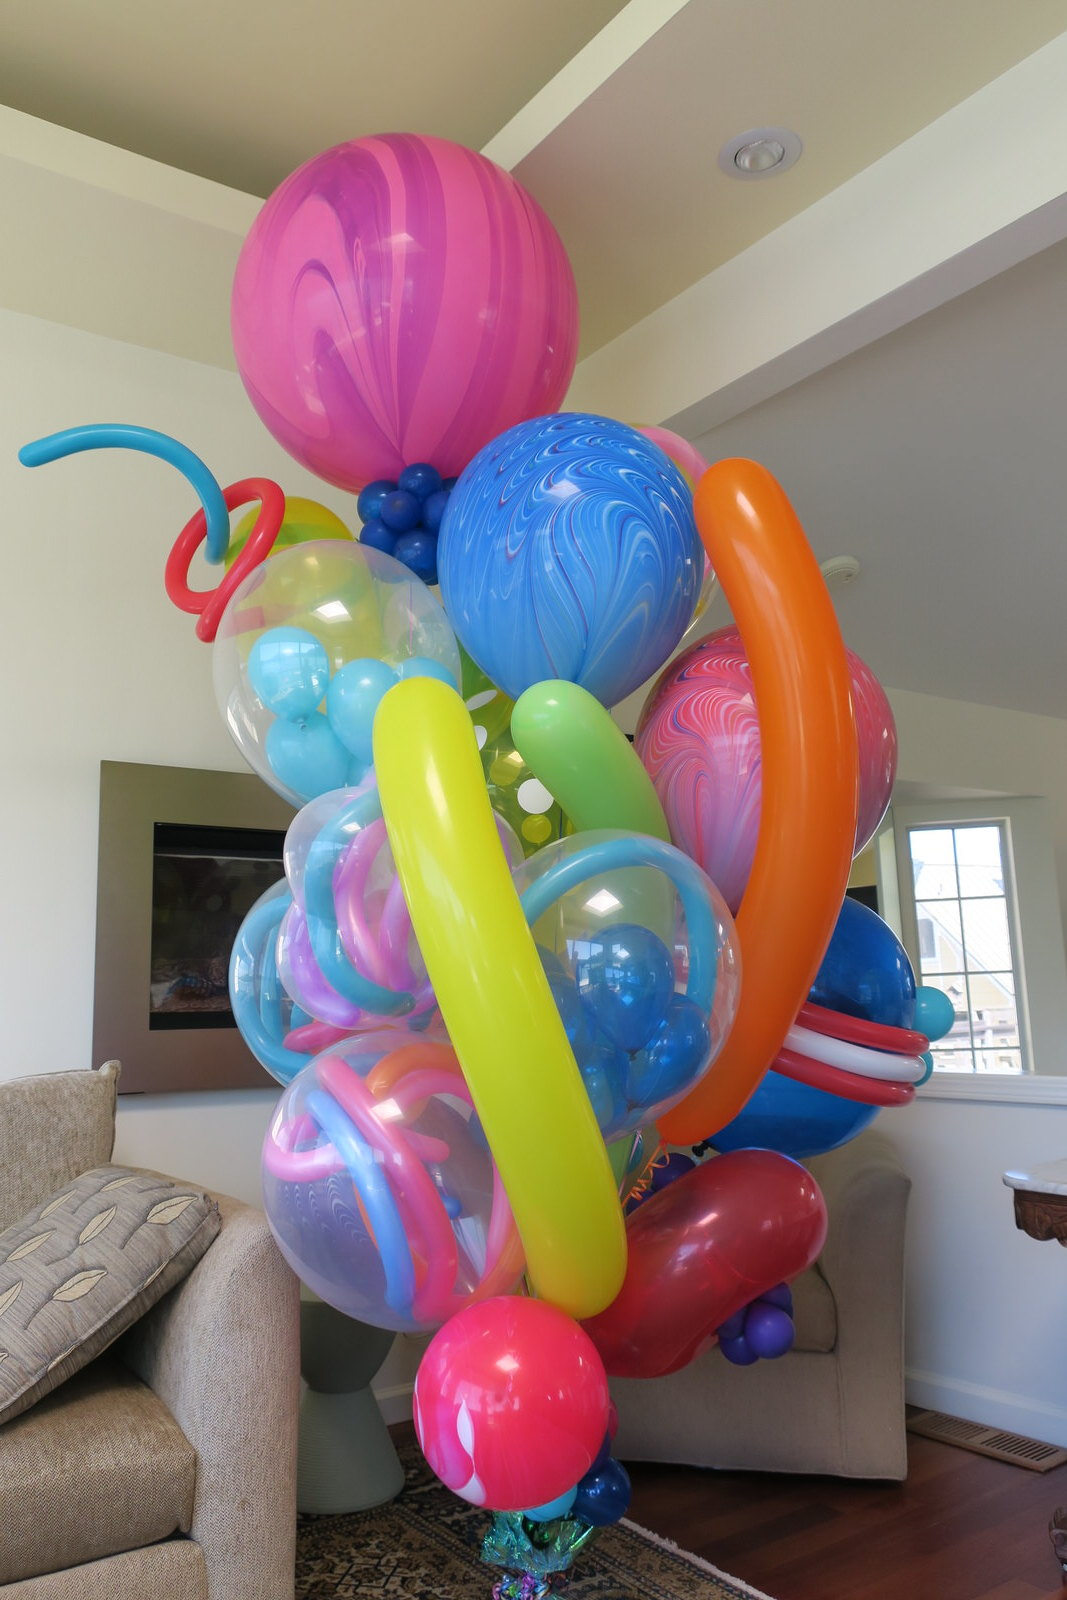 Balloon Specialties Unique Balloon Bouquet.JPG